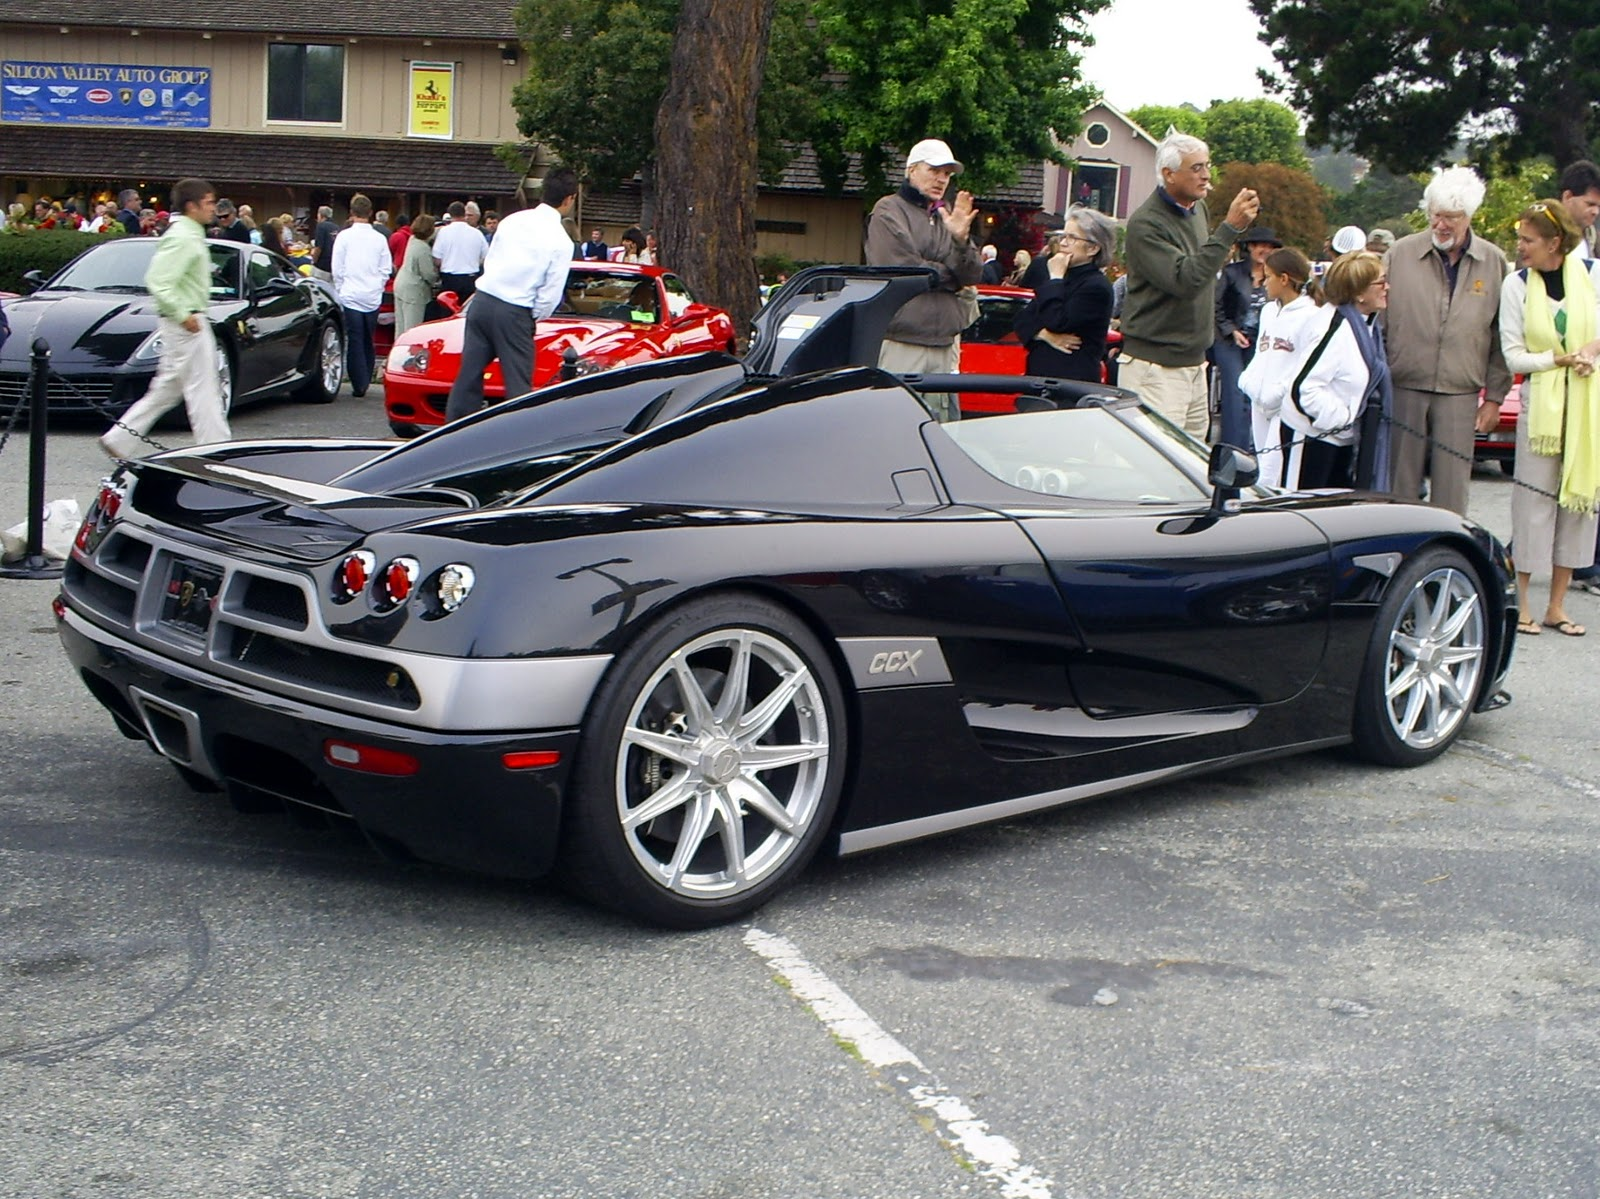 Car-model-2012: Koenigsegg Ccx